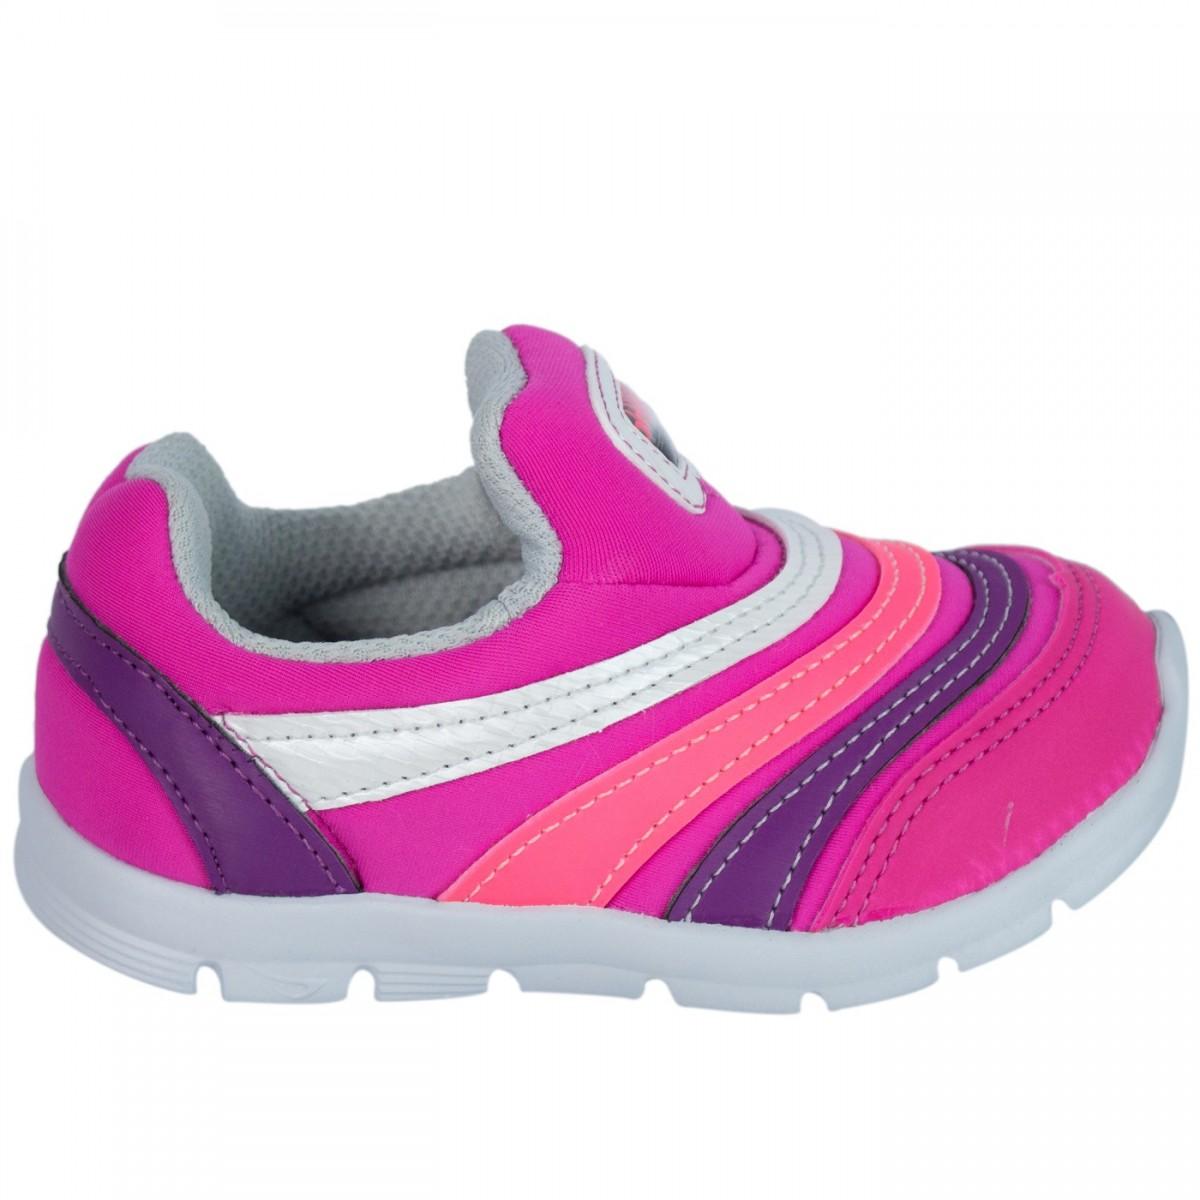 827c23b36b0 Bizz Store - Tênis Infantil Feminino Ortopé EVA Baby Pink Branco